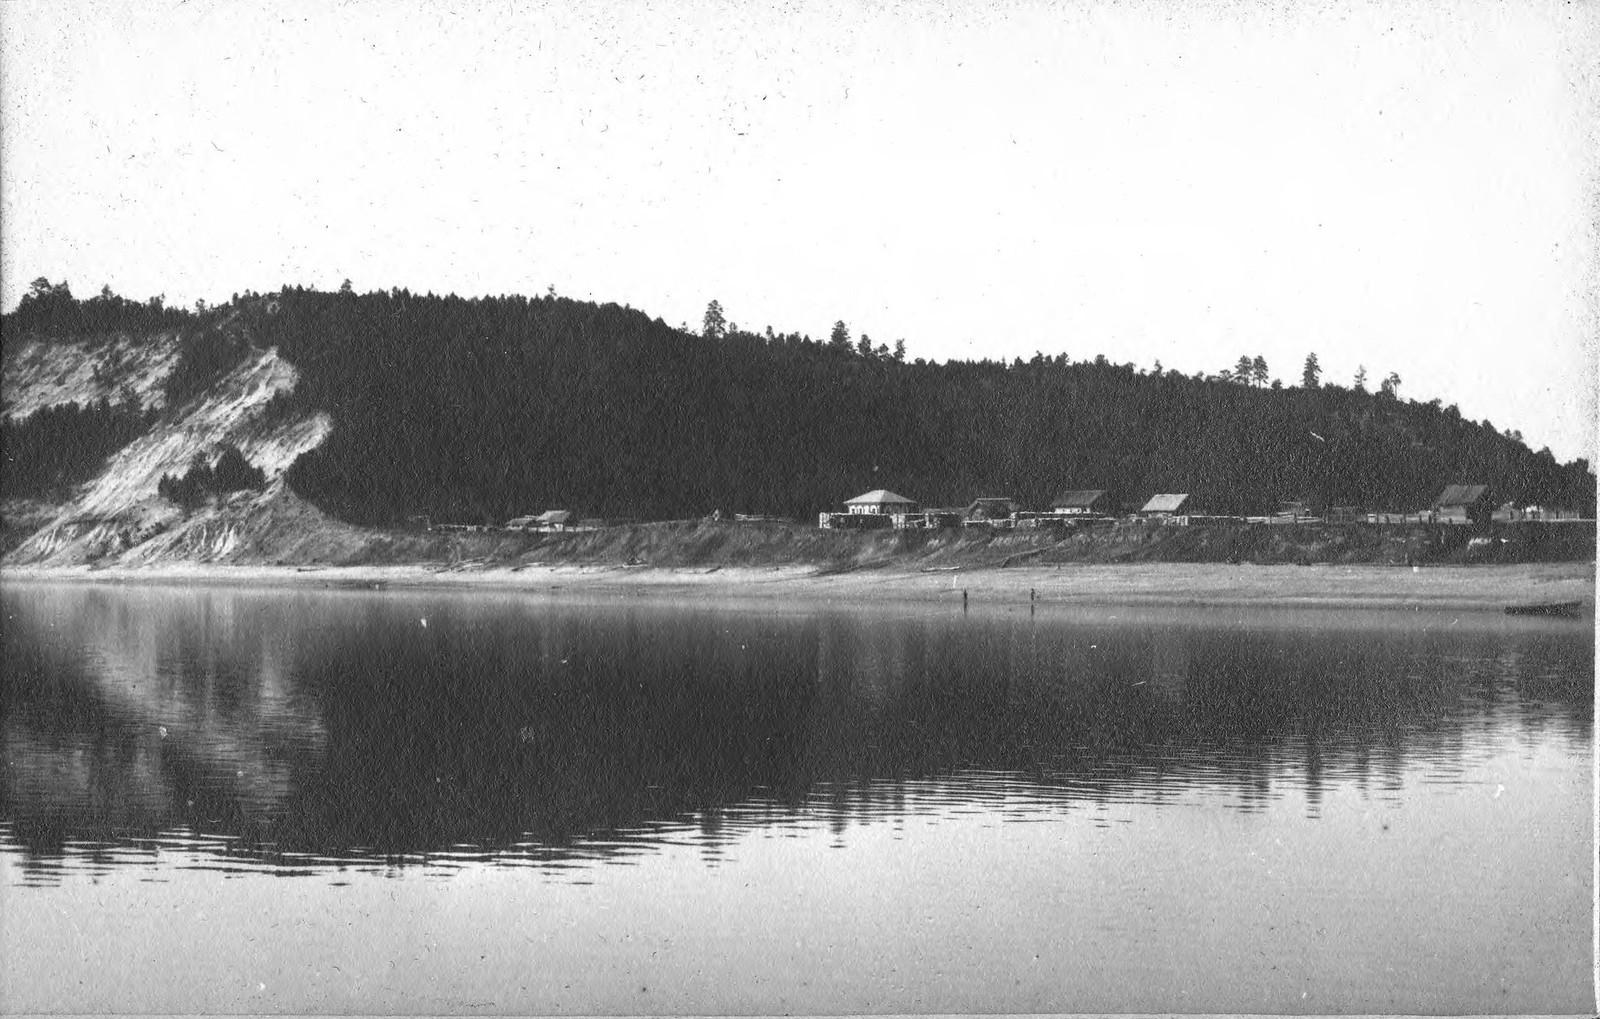 Вид села Малая Сазанка на реке Зее